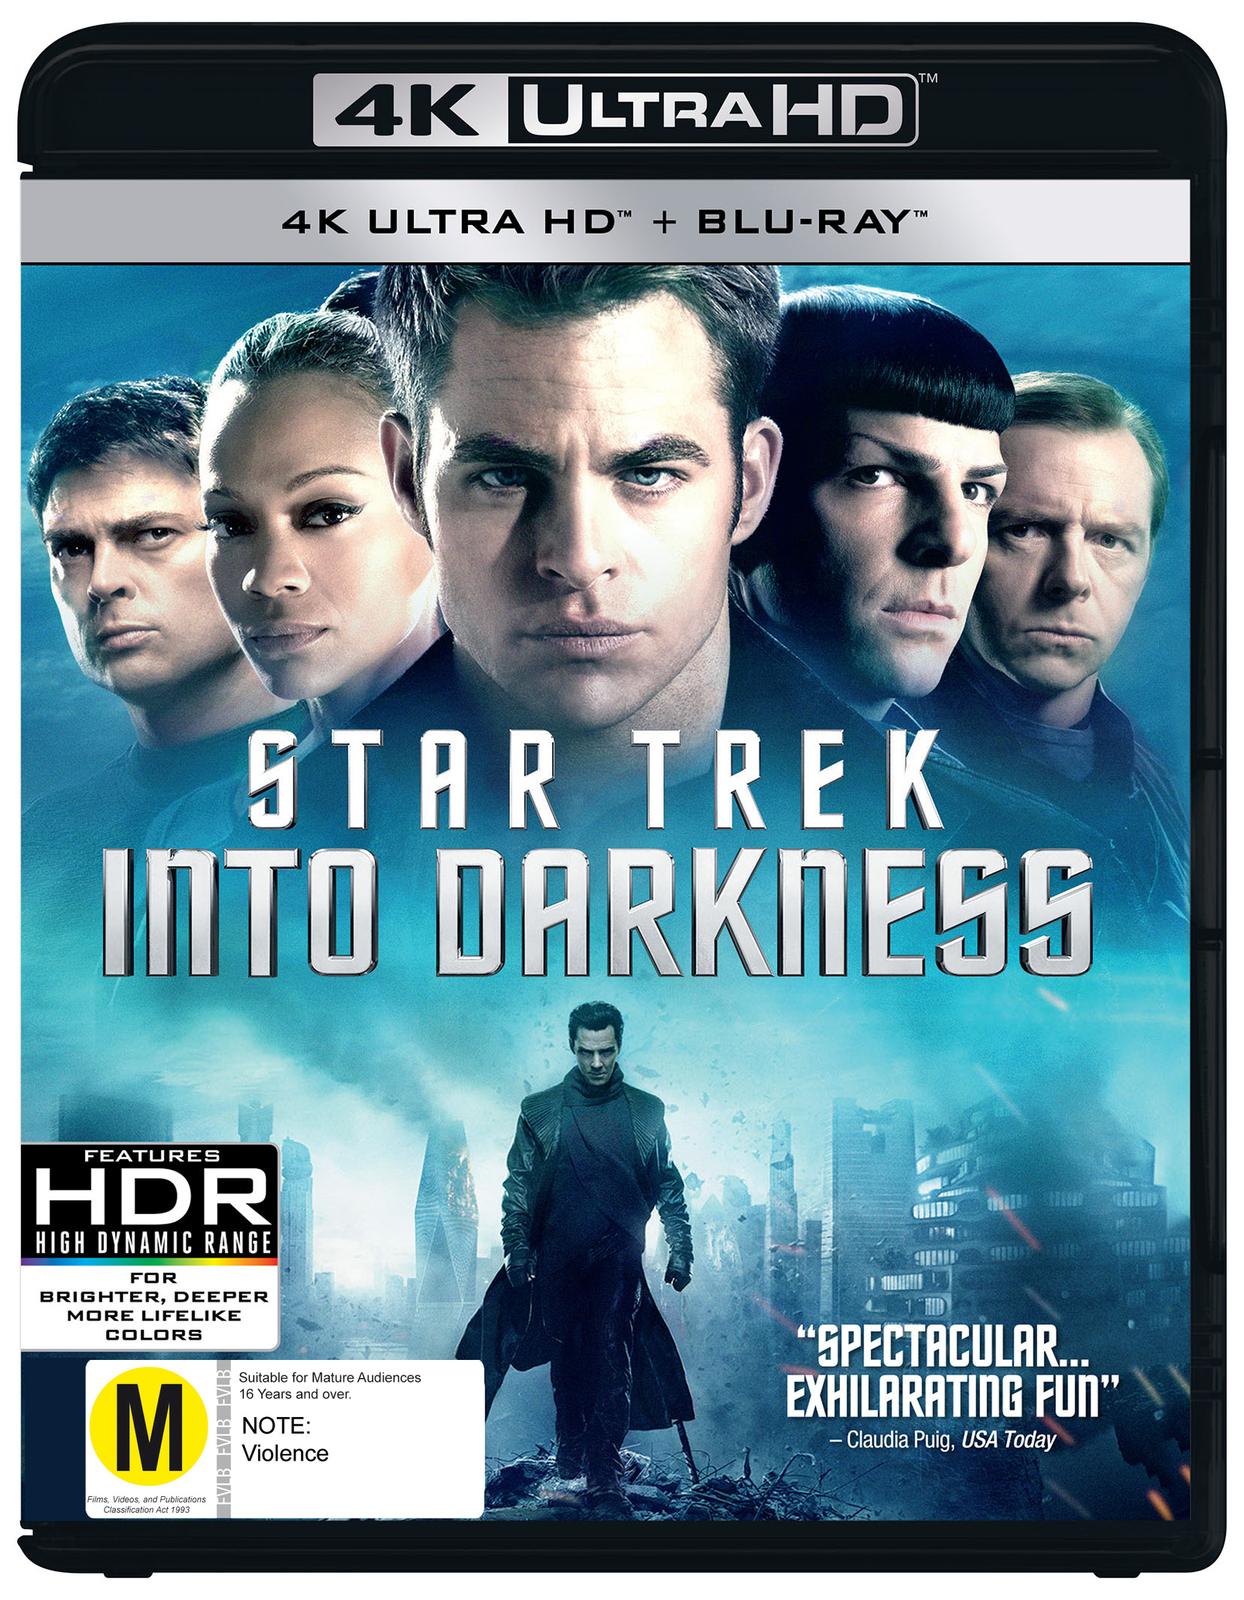 Star Trek: Into Darkness on Blu-ray, UHD Blu-ray image